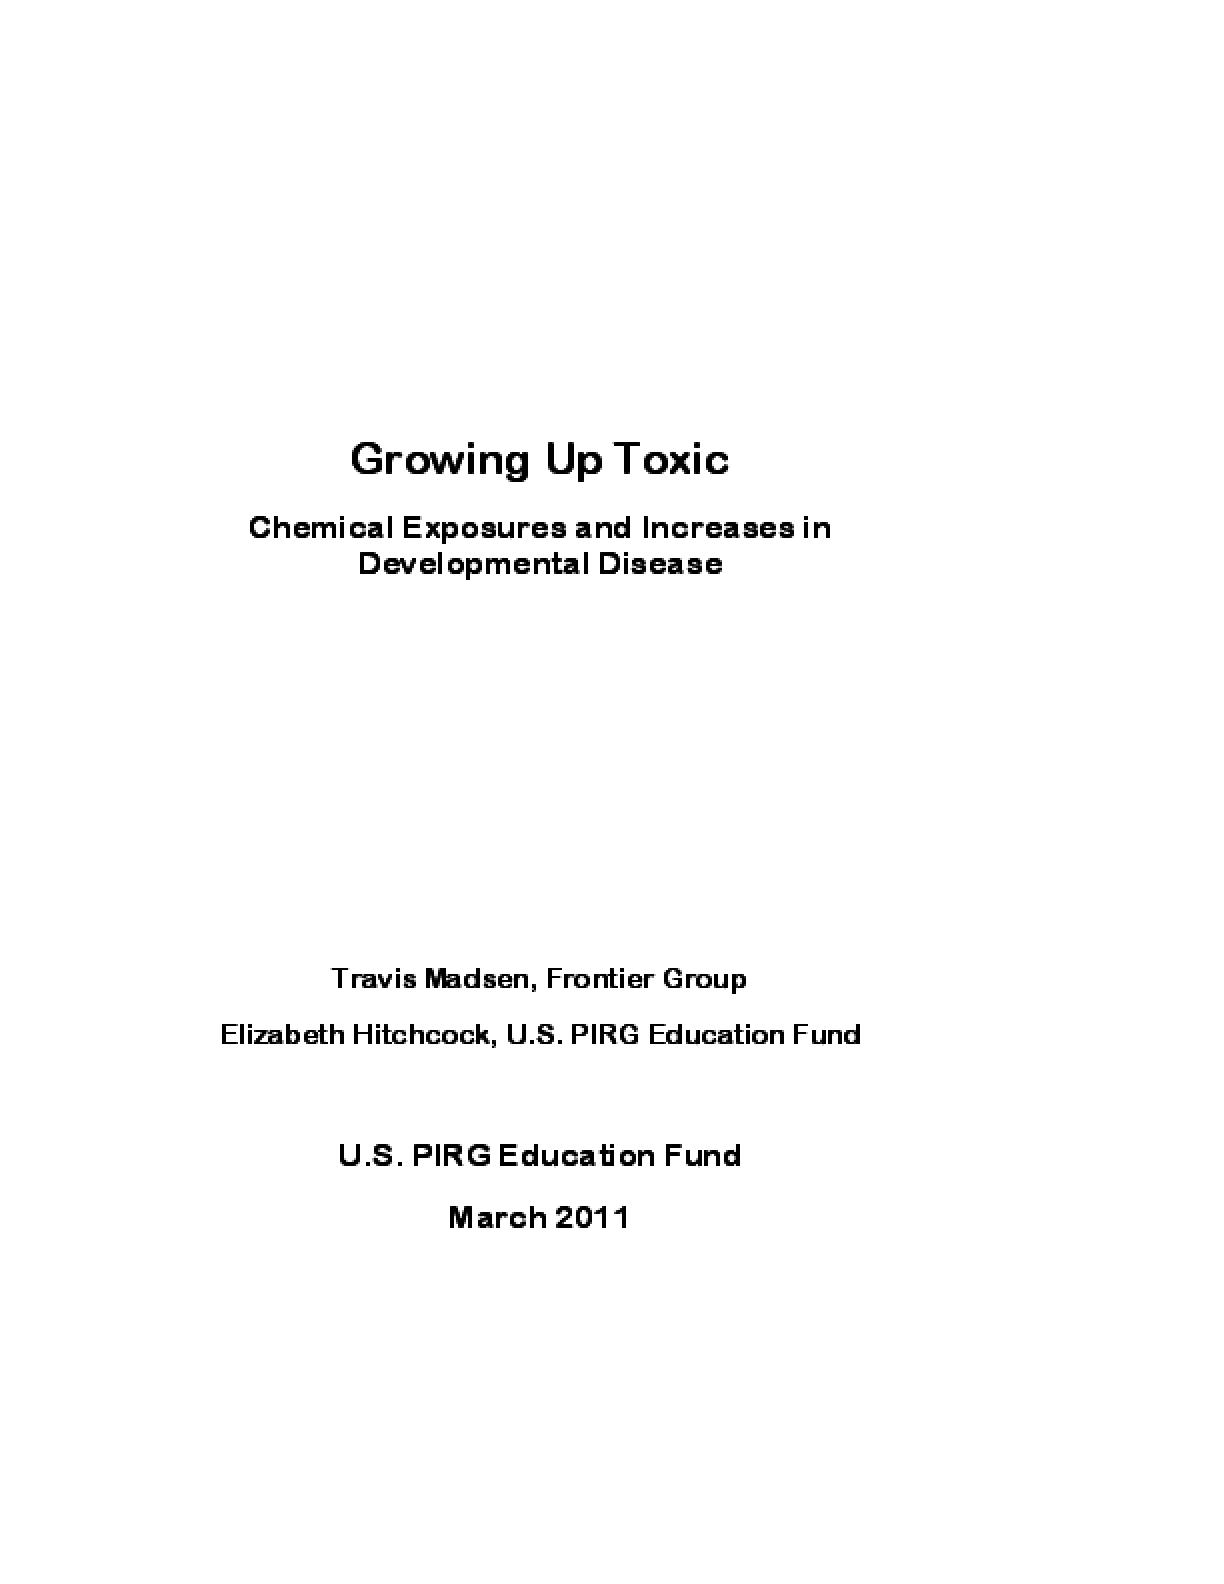 Growing Up Toxic: Chemical Exposures and Increases in Developmental Disease